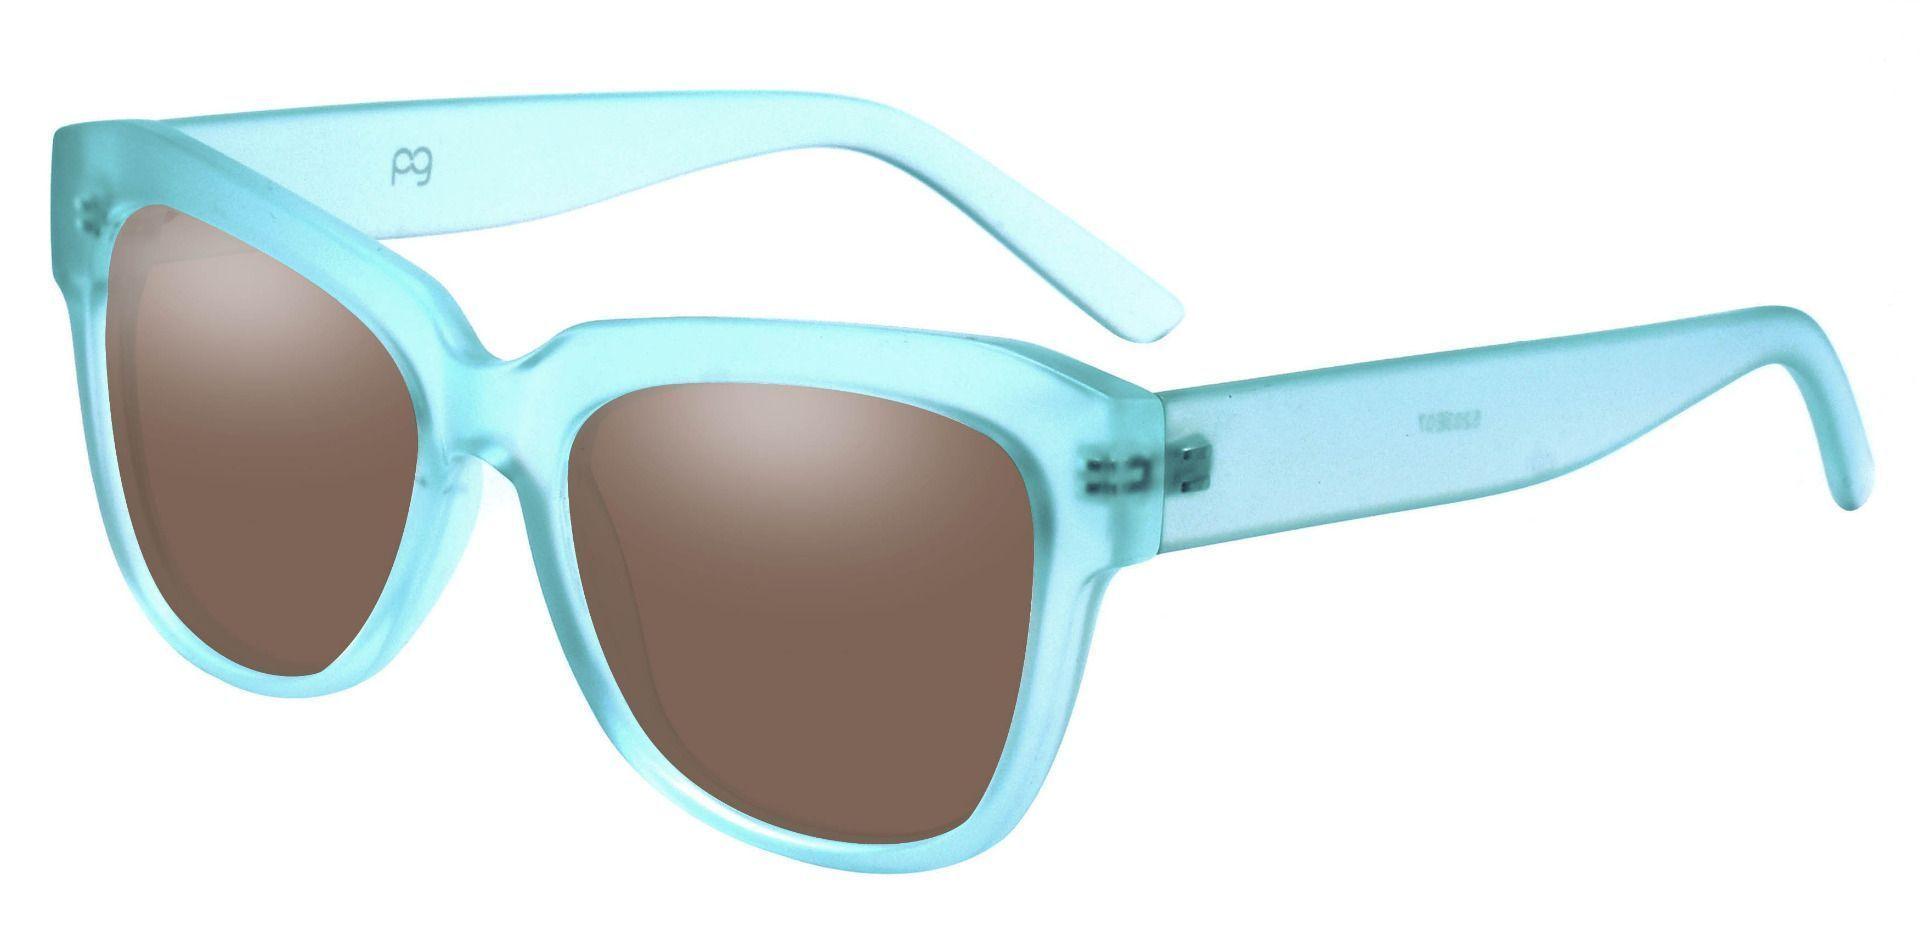 Gina Cat-Eye Progressive Sunglasses - Blue Frame With Brown Lenses